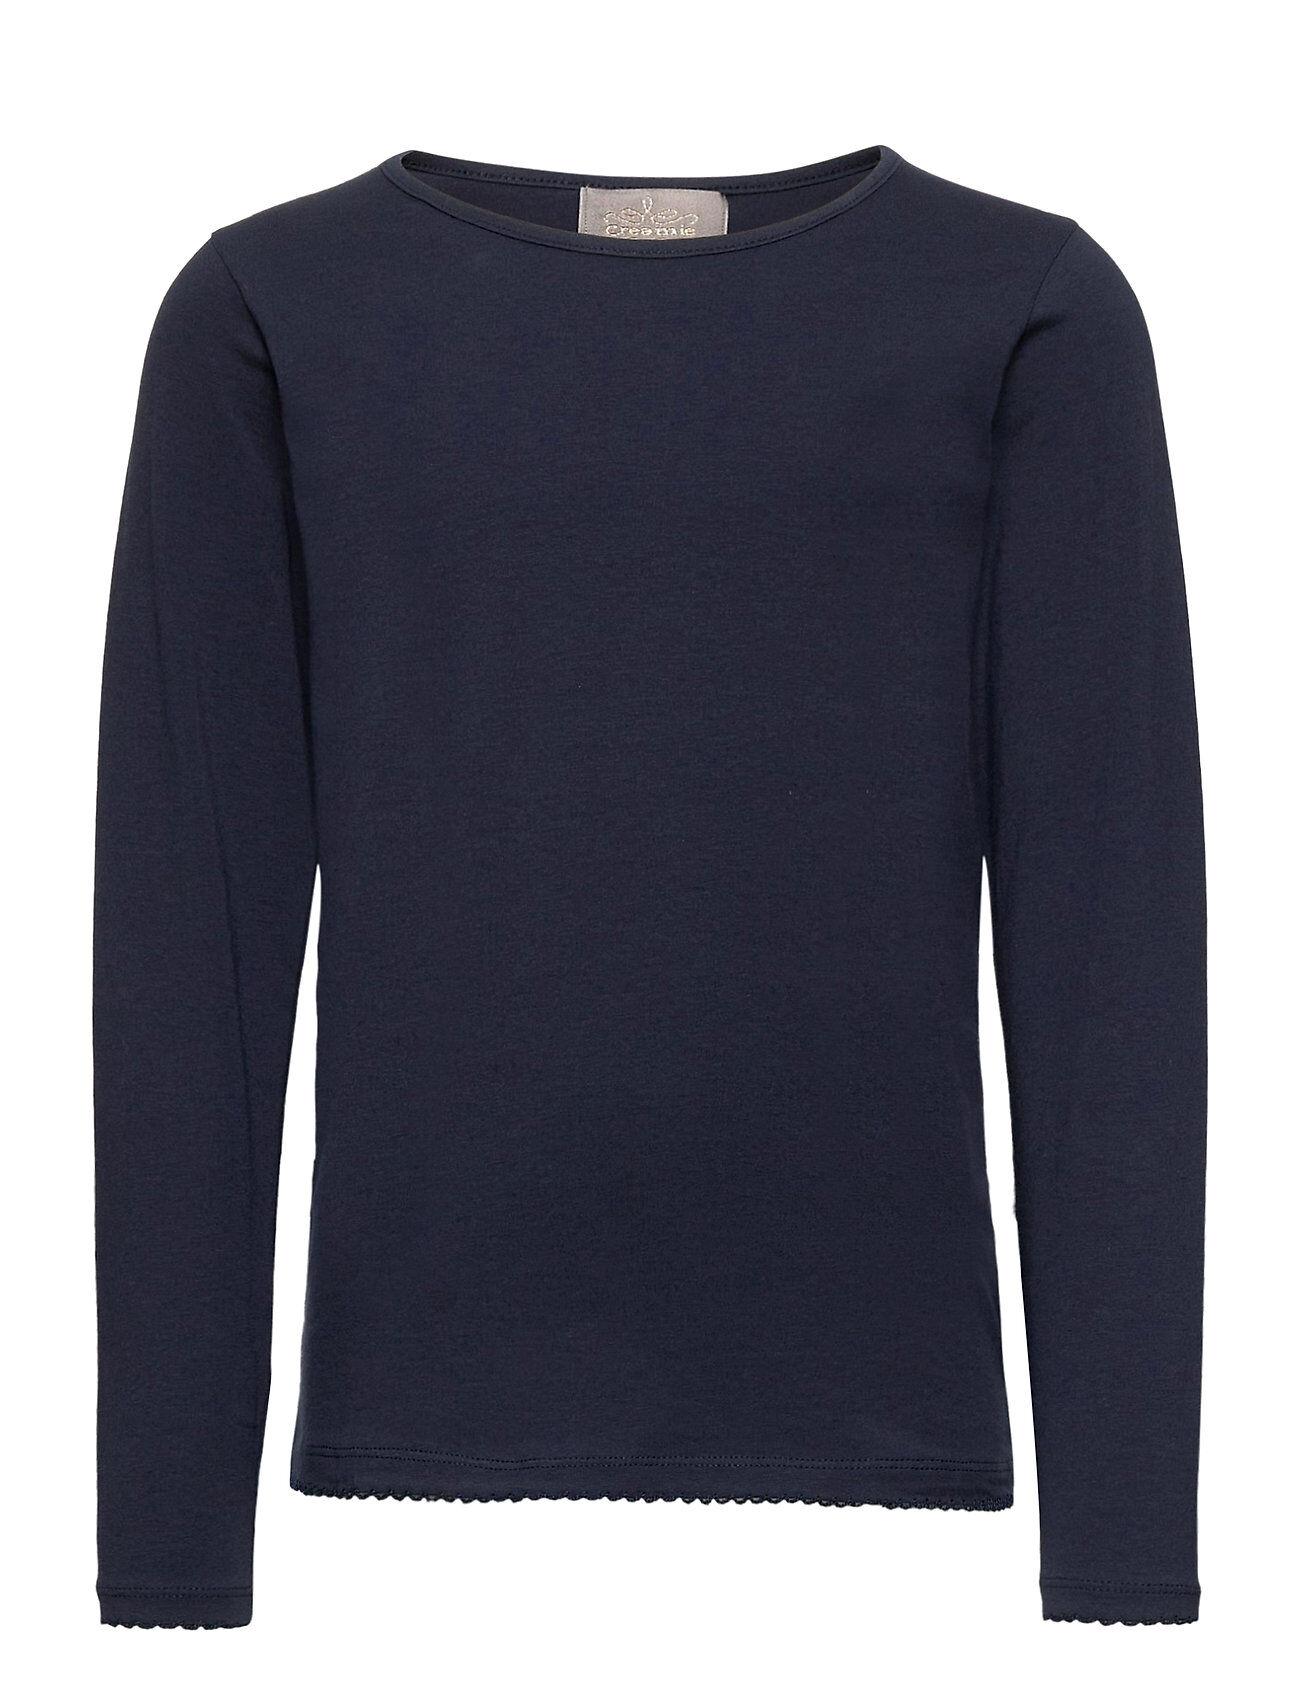 Creamie T-Shirt Ls T-shirts Long-sleeved T-shirts Sininen Creamie